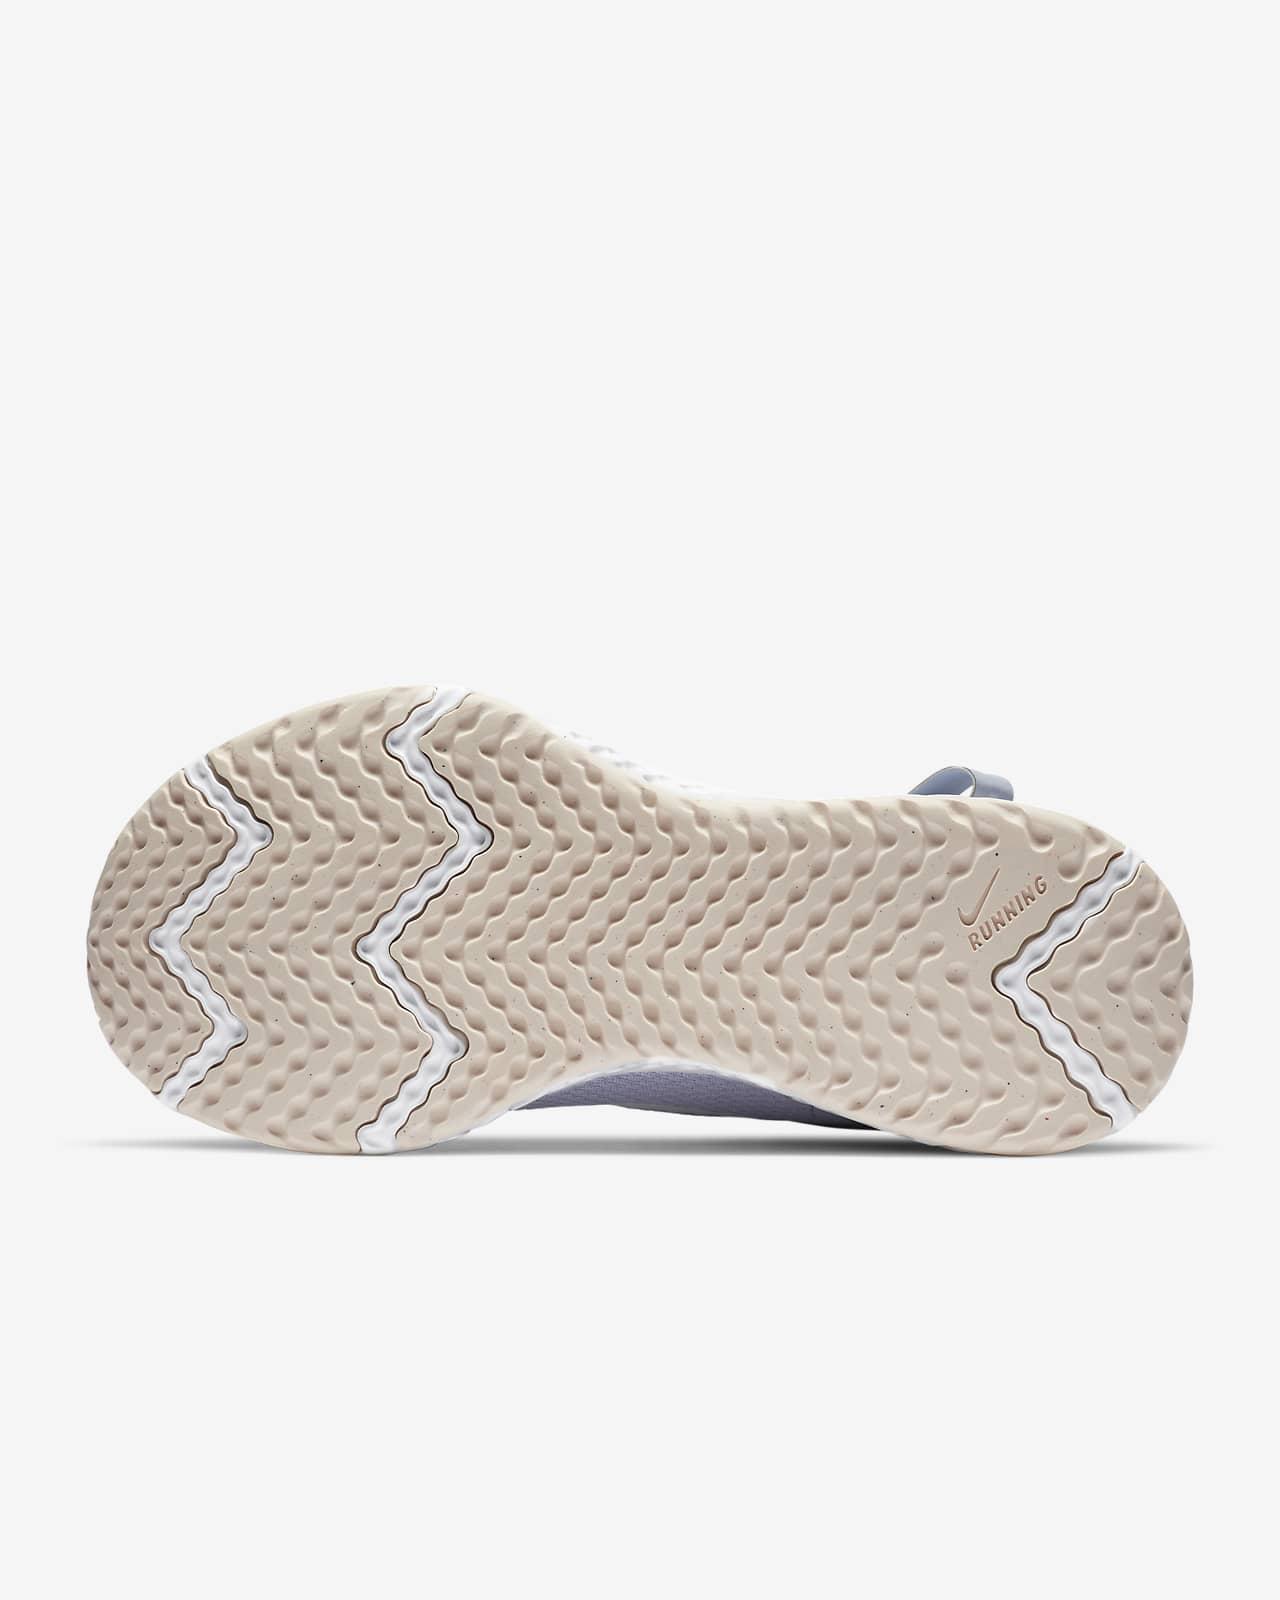 nike chaussure femme compenser